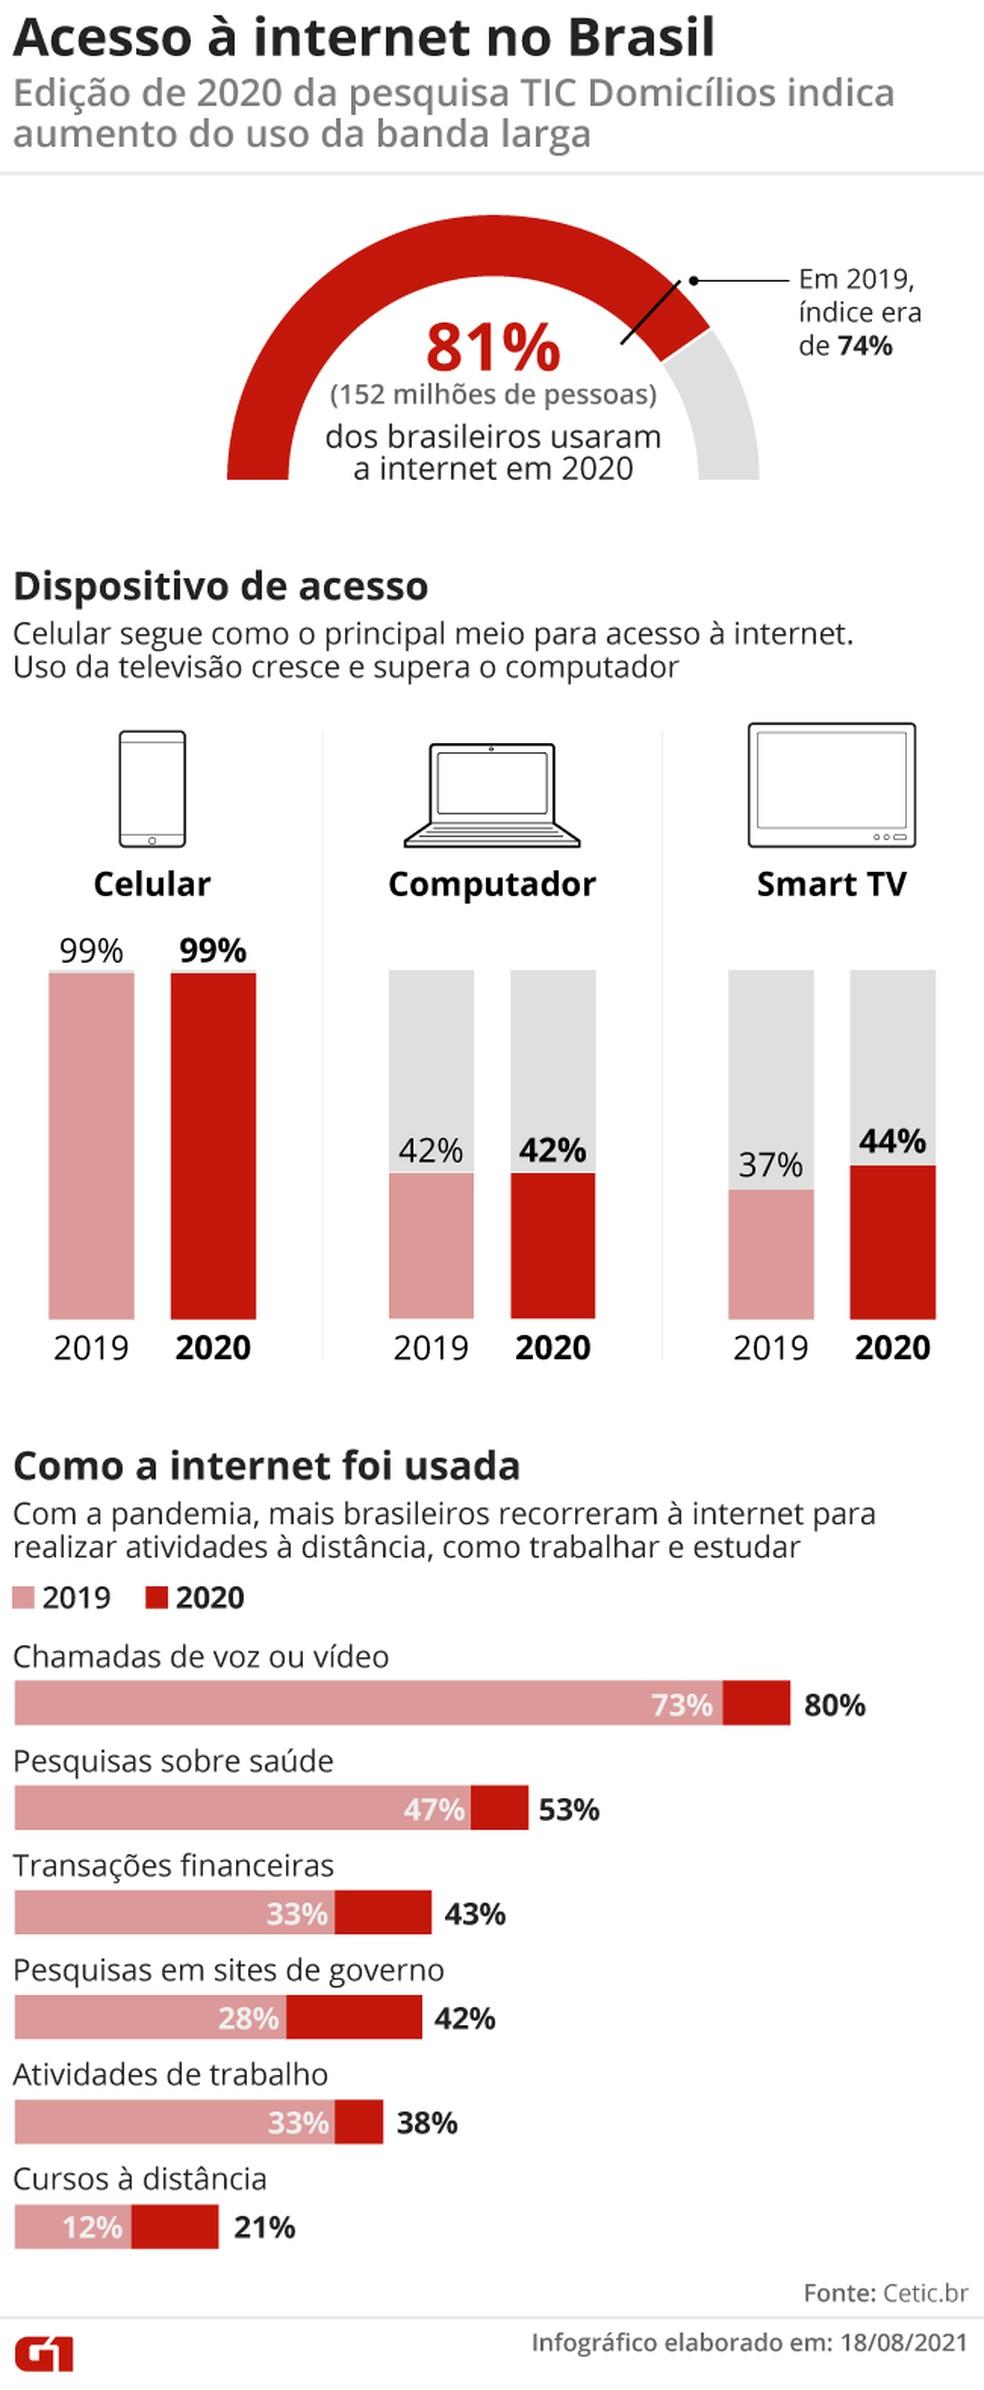 TIC Domicílios 2020 aponta crescimento do uso da internet no Brasil. — Foto: Kayan Silva/G1